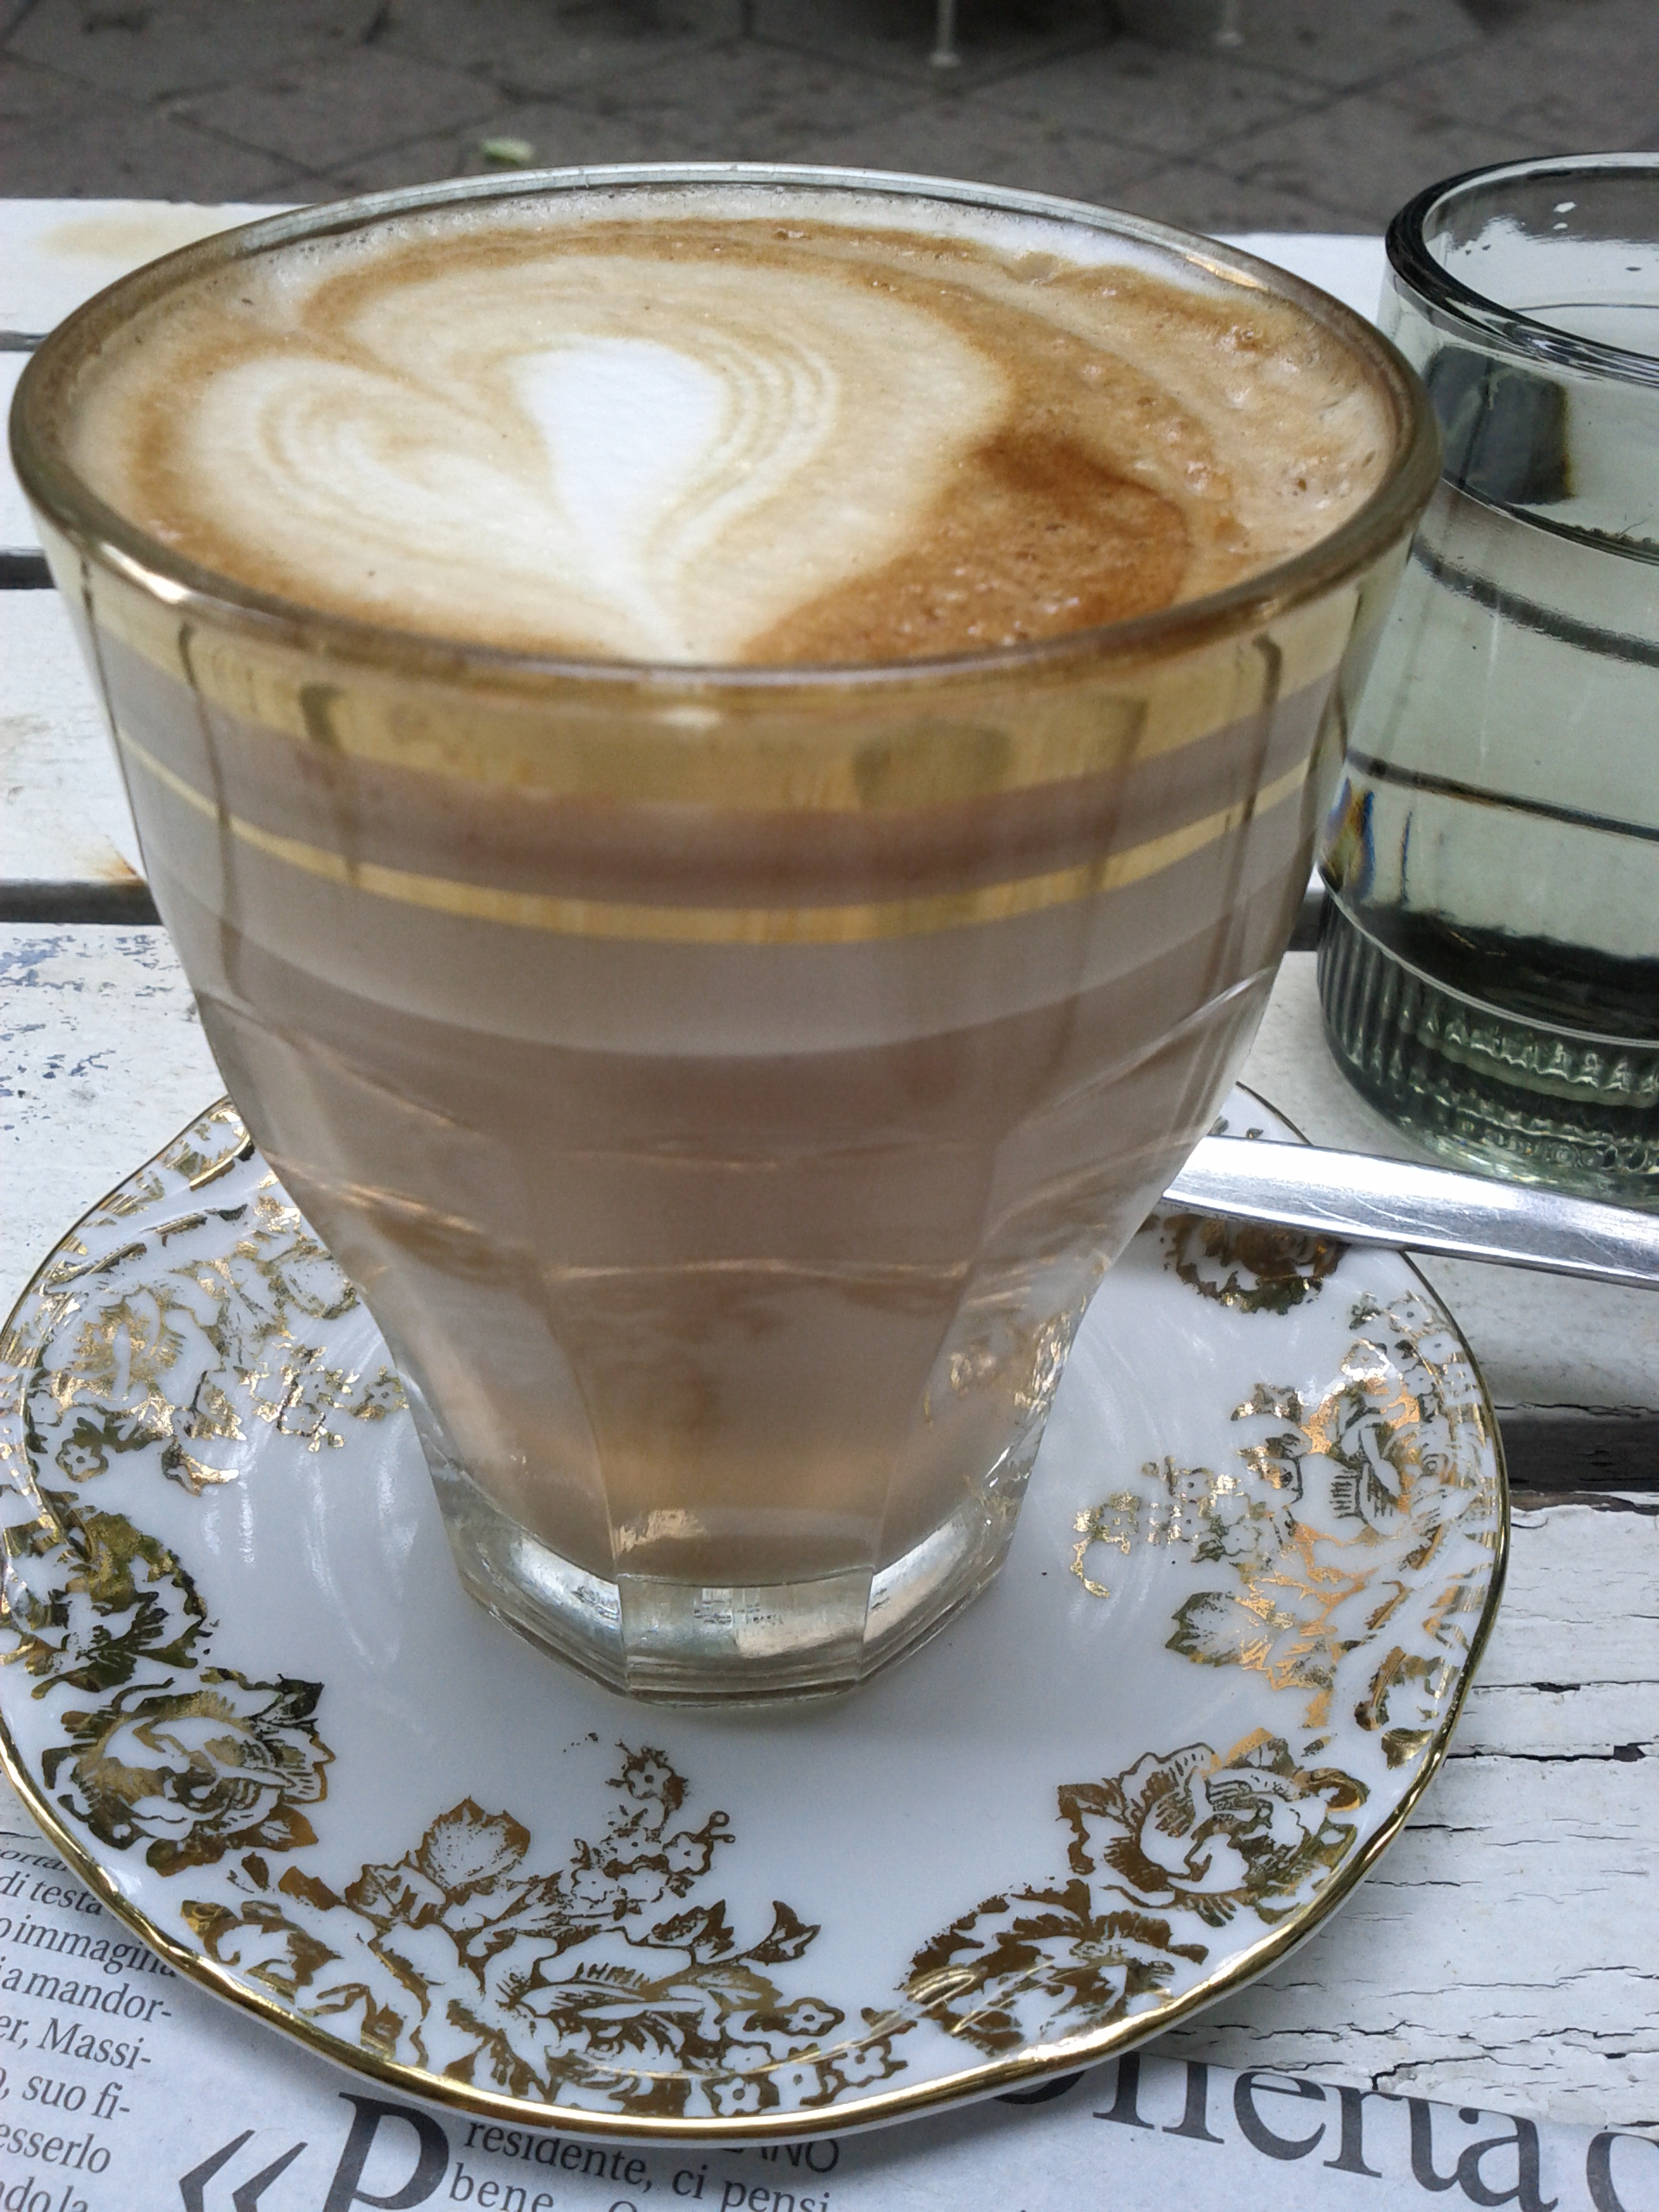 Cappuccino im Café Velntin